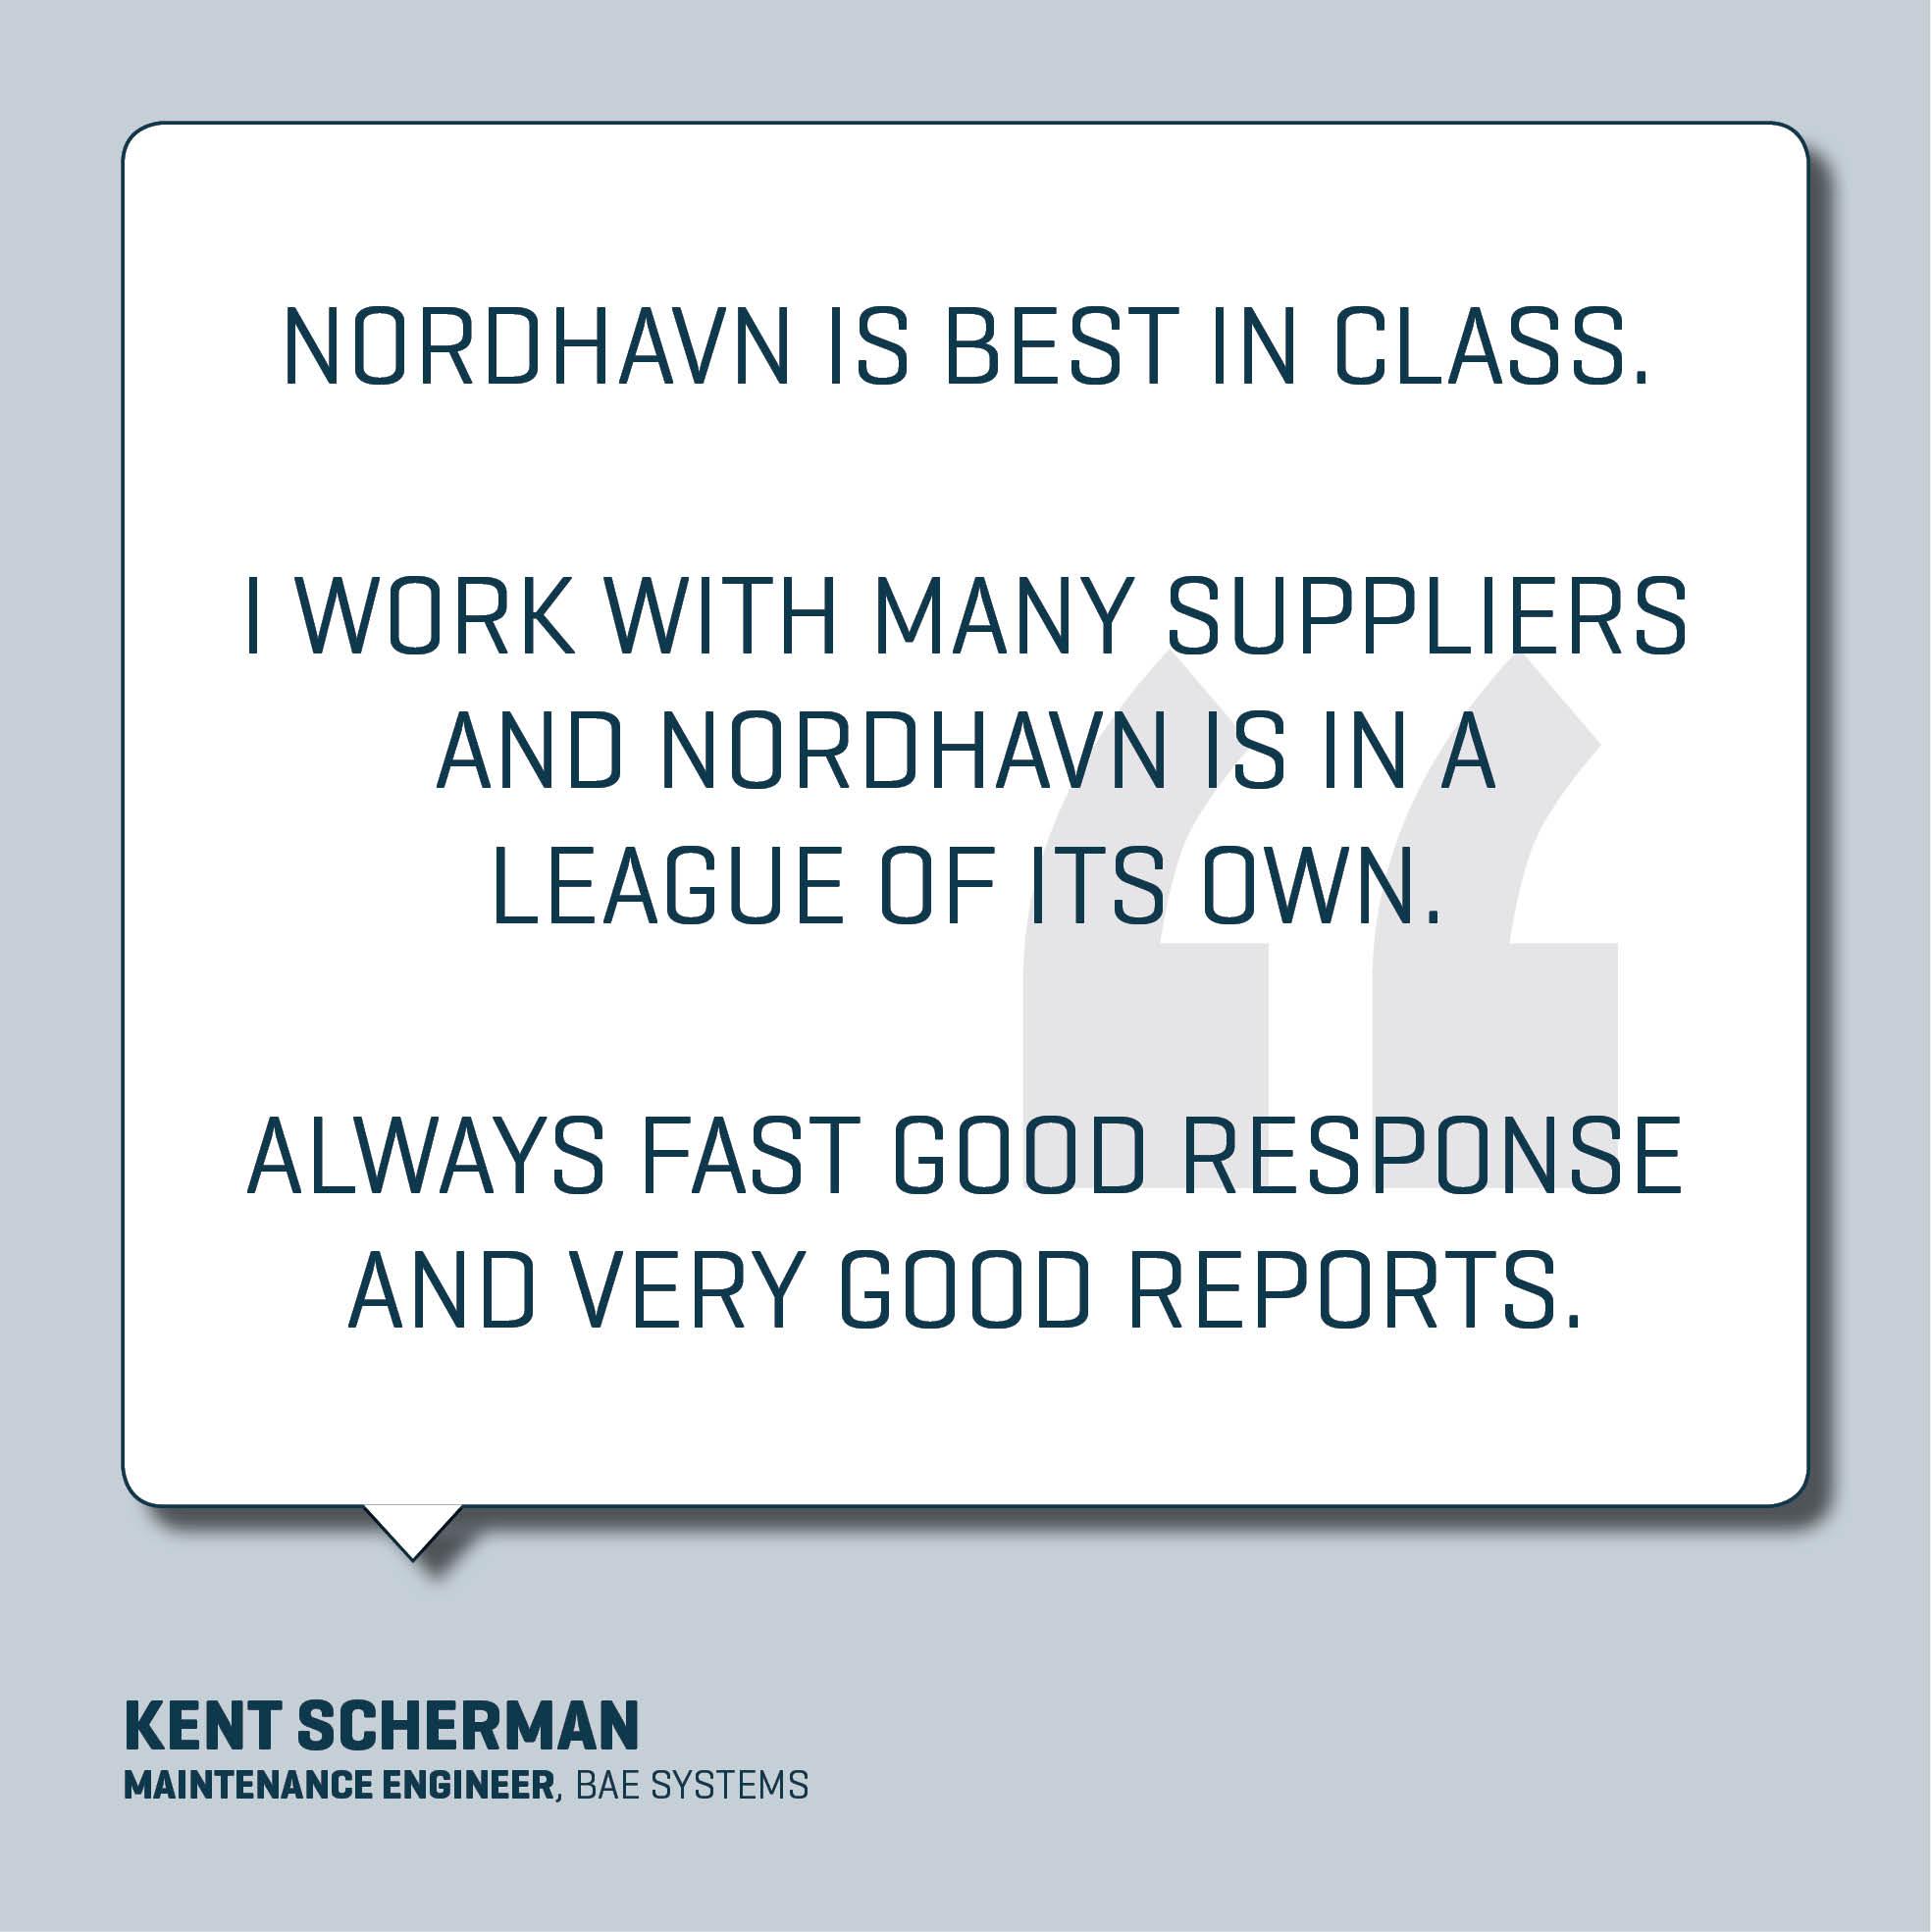 Kent Scherman - BAE Systems